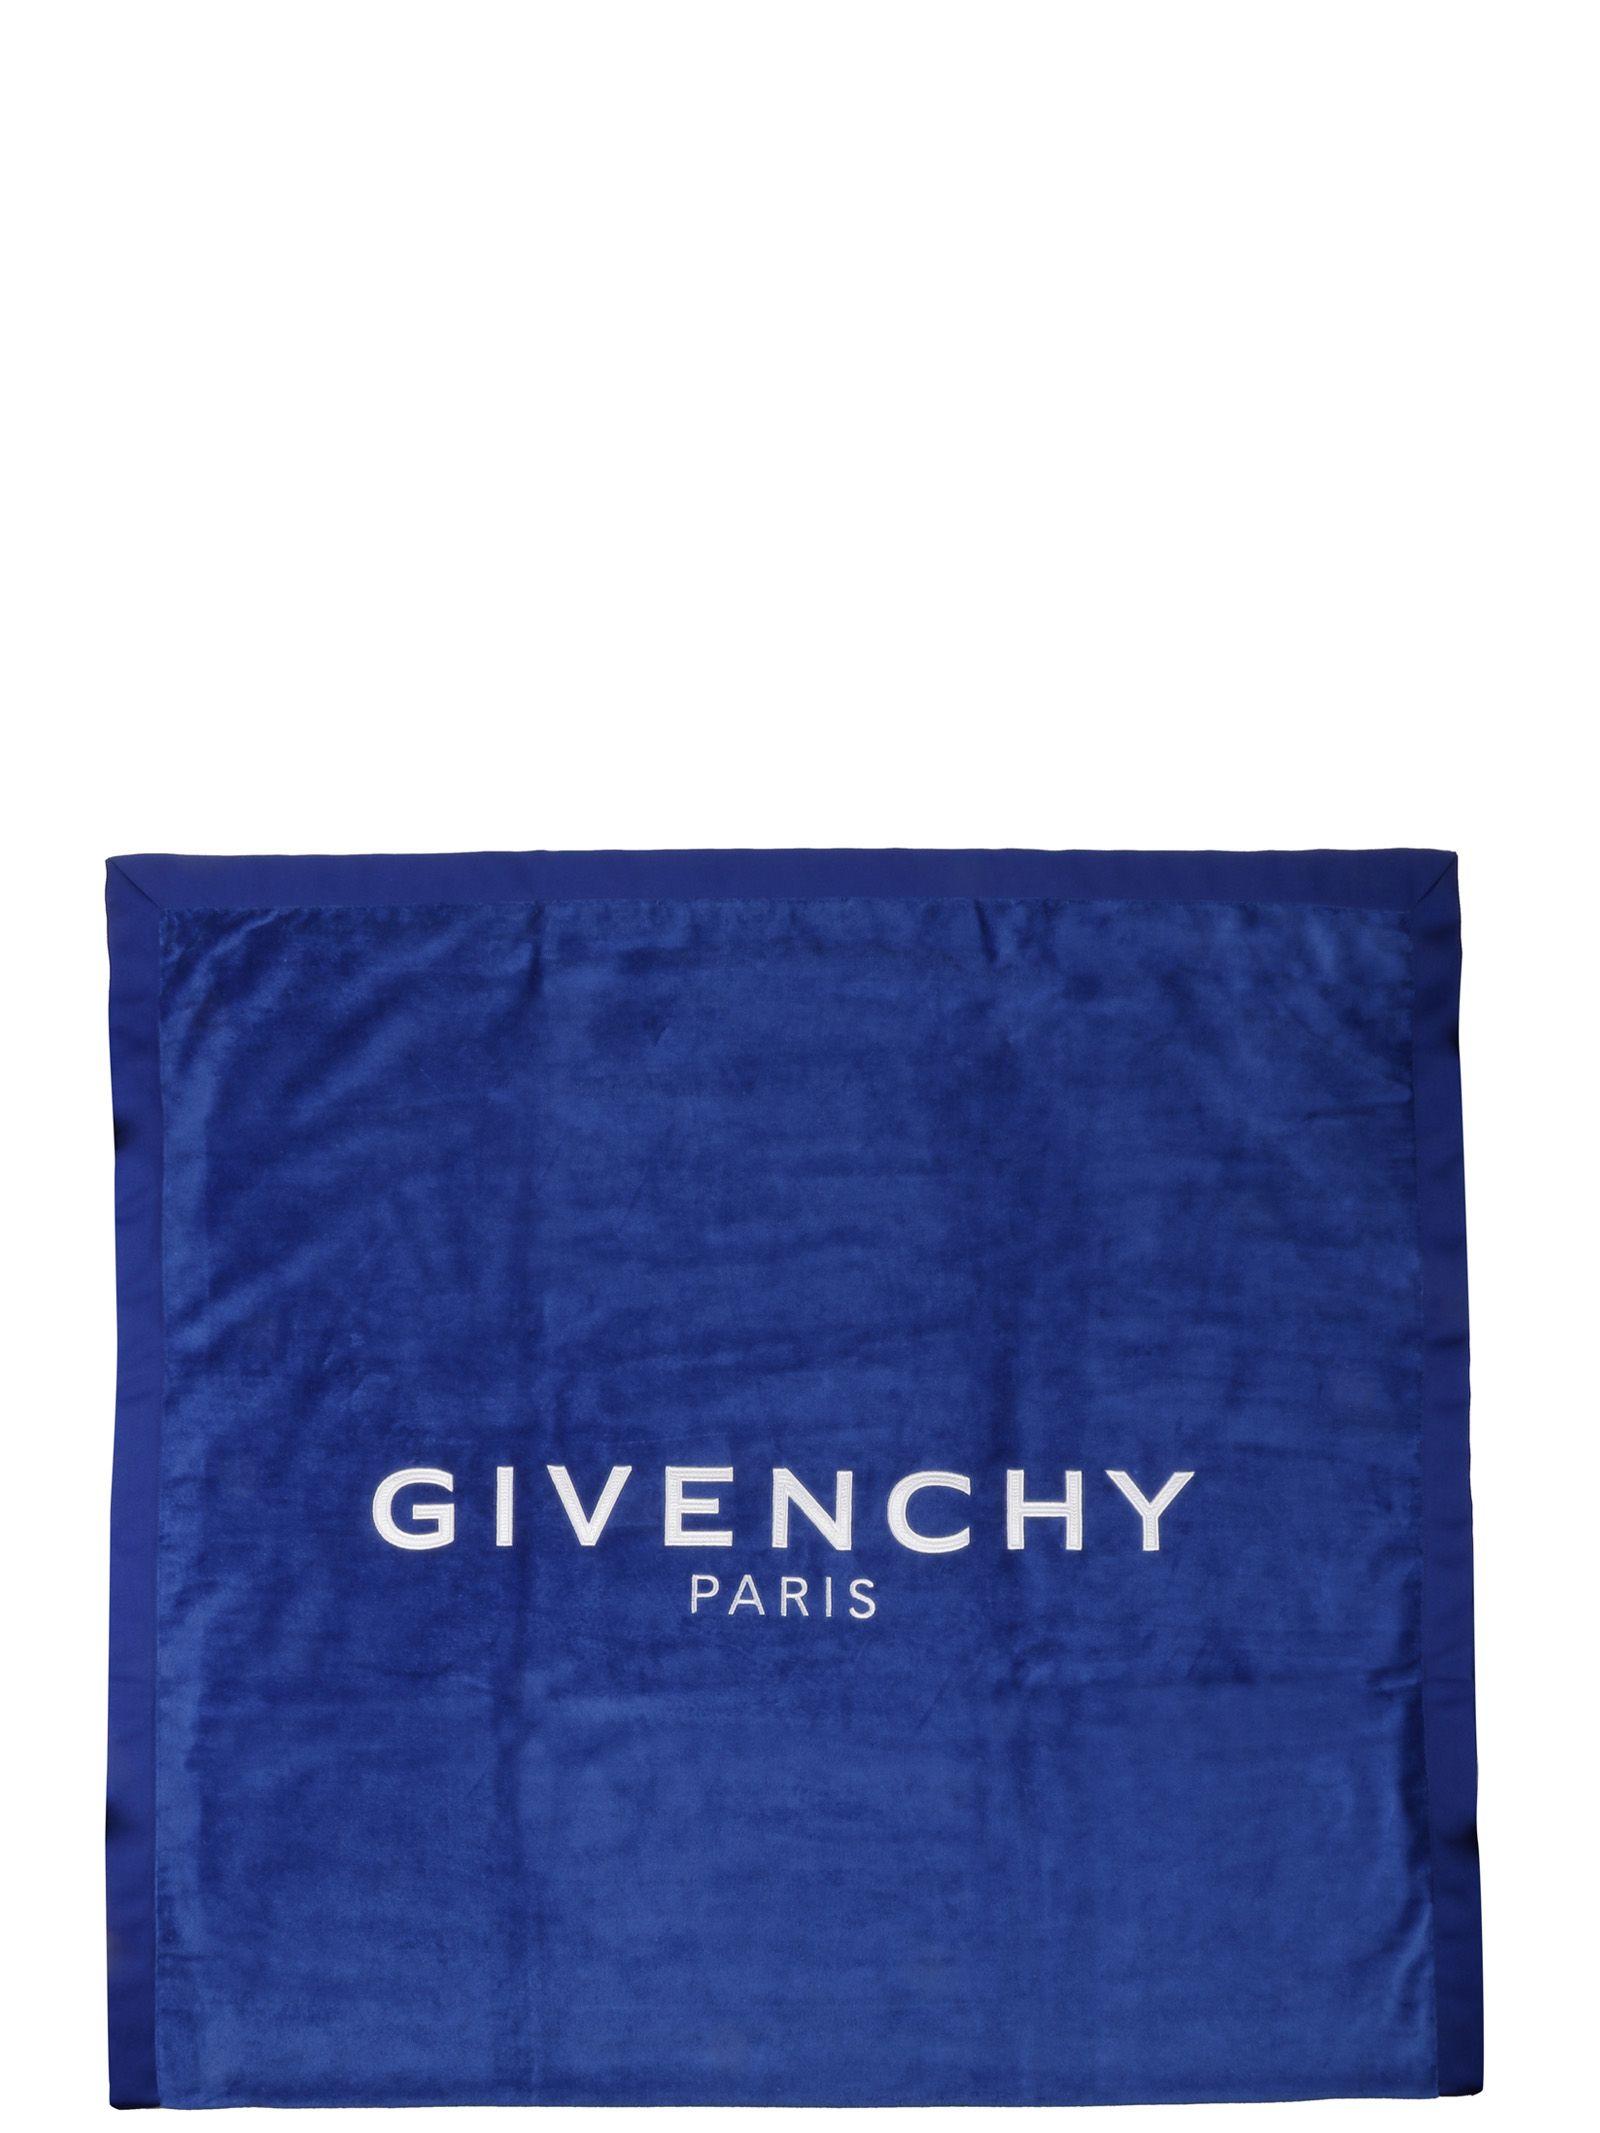 Givenchy Logo Beach Towel